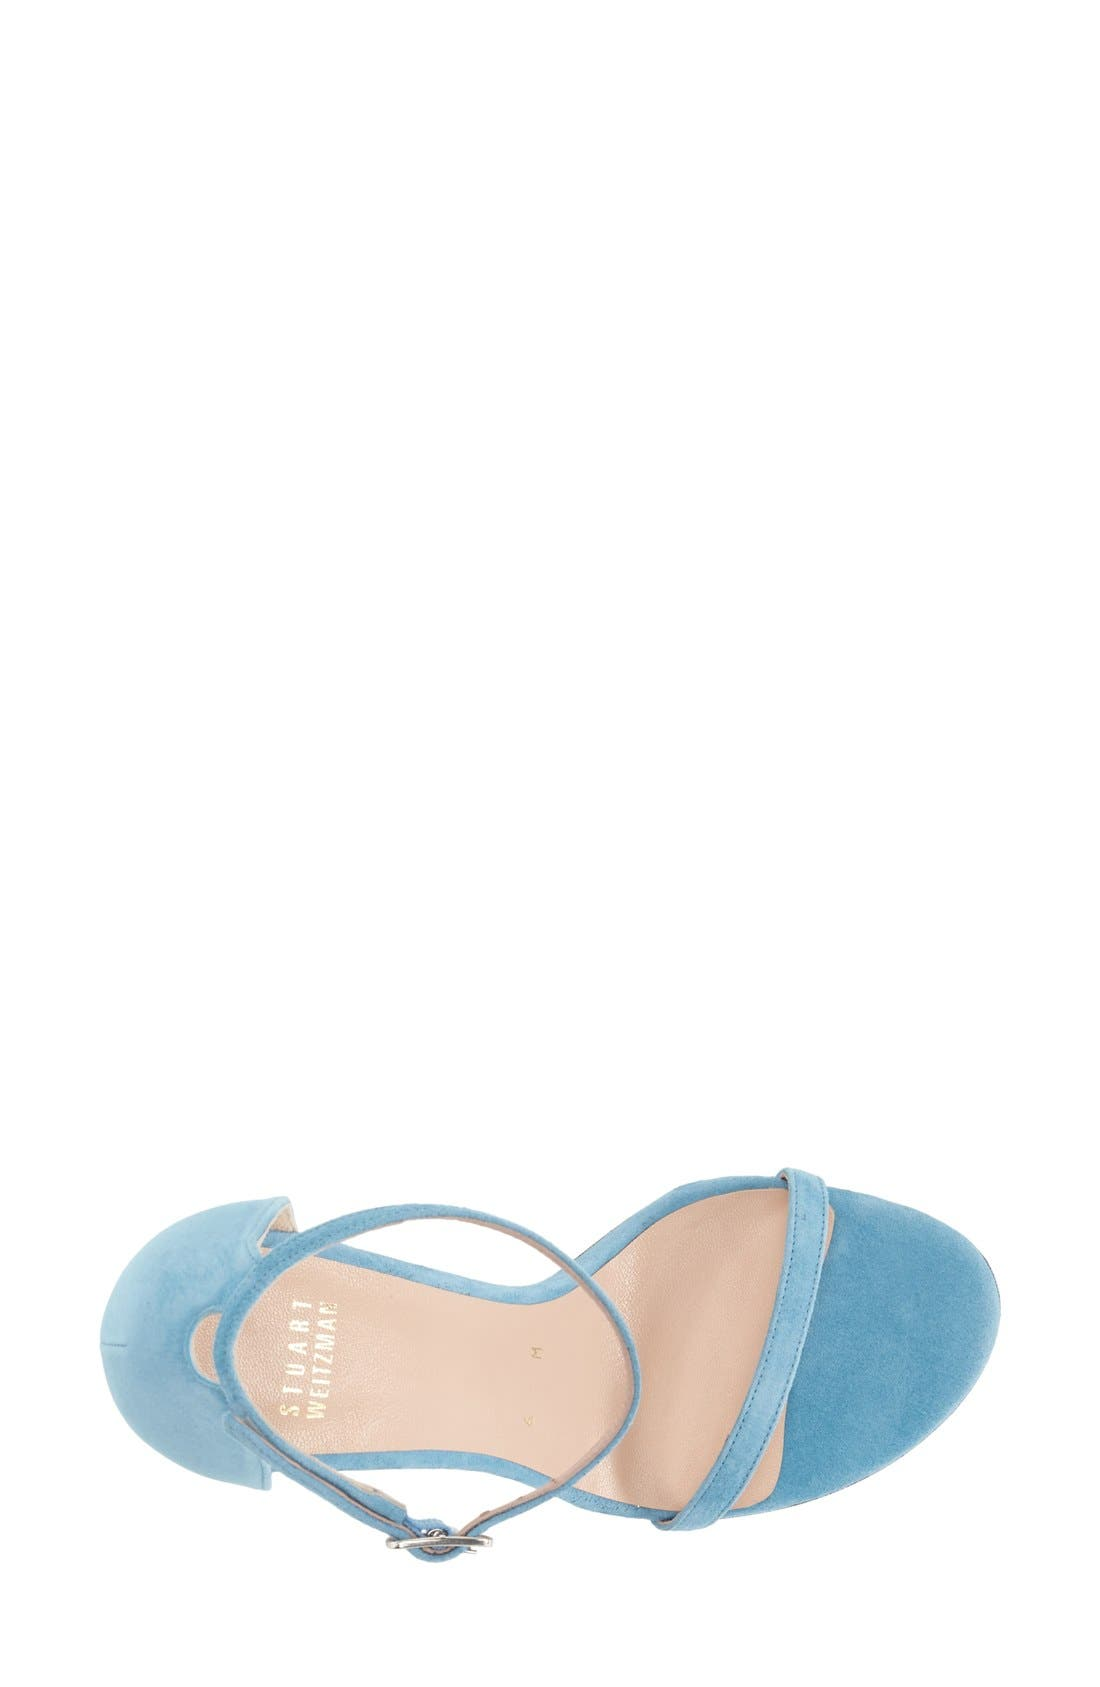 Nudistsong Ankle Strap Sandal,                             Alternate thumbnail 72, color,